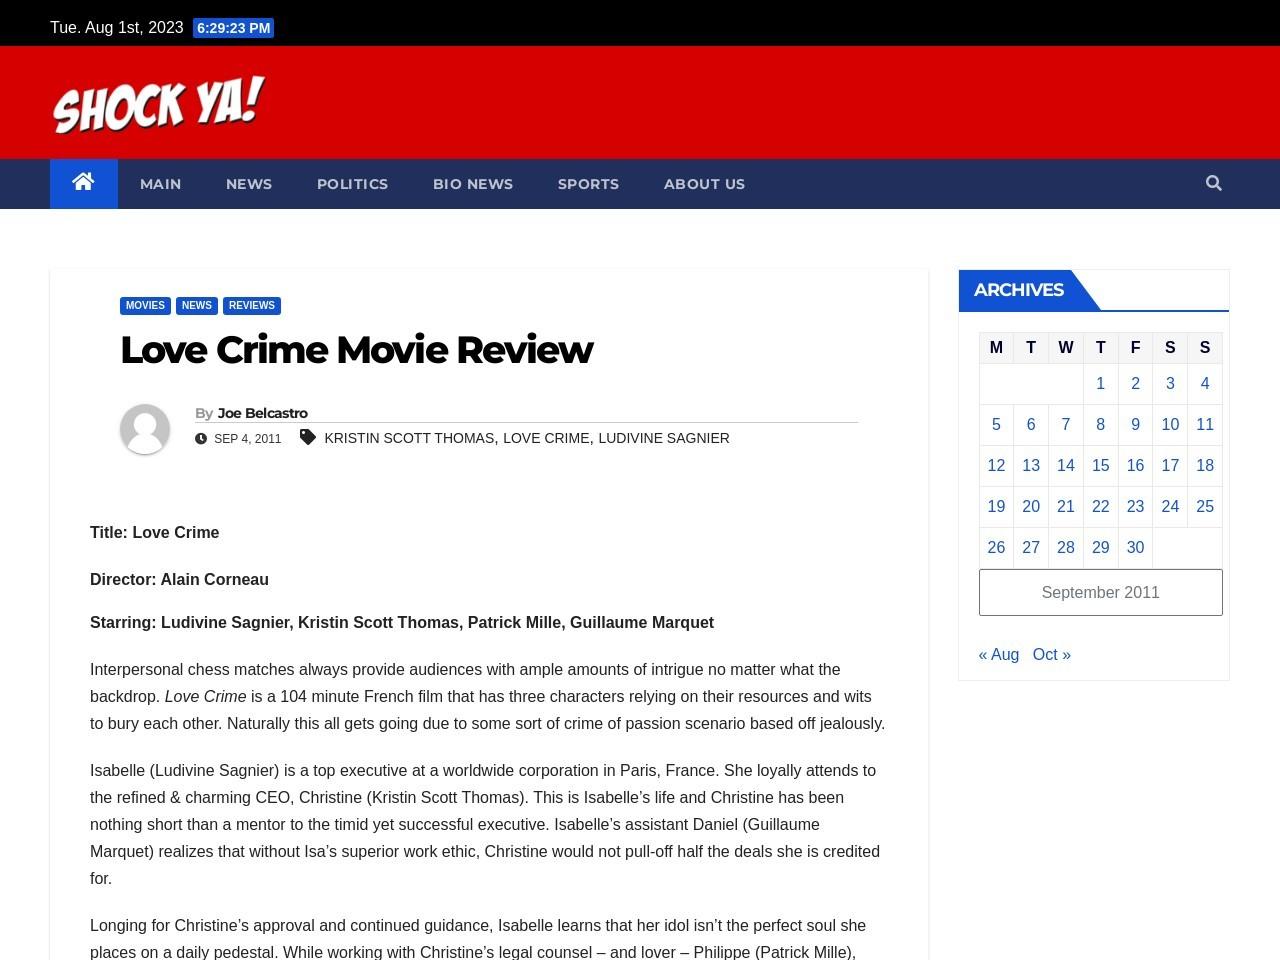 Love Crime Movie Review : Shockya.com